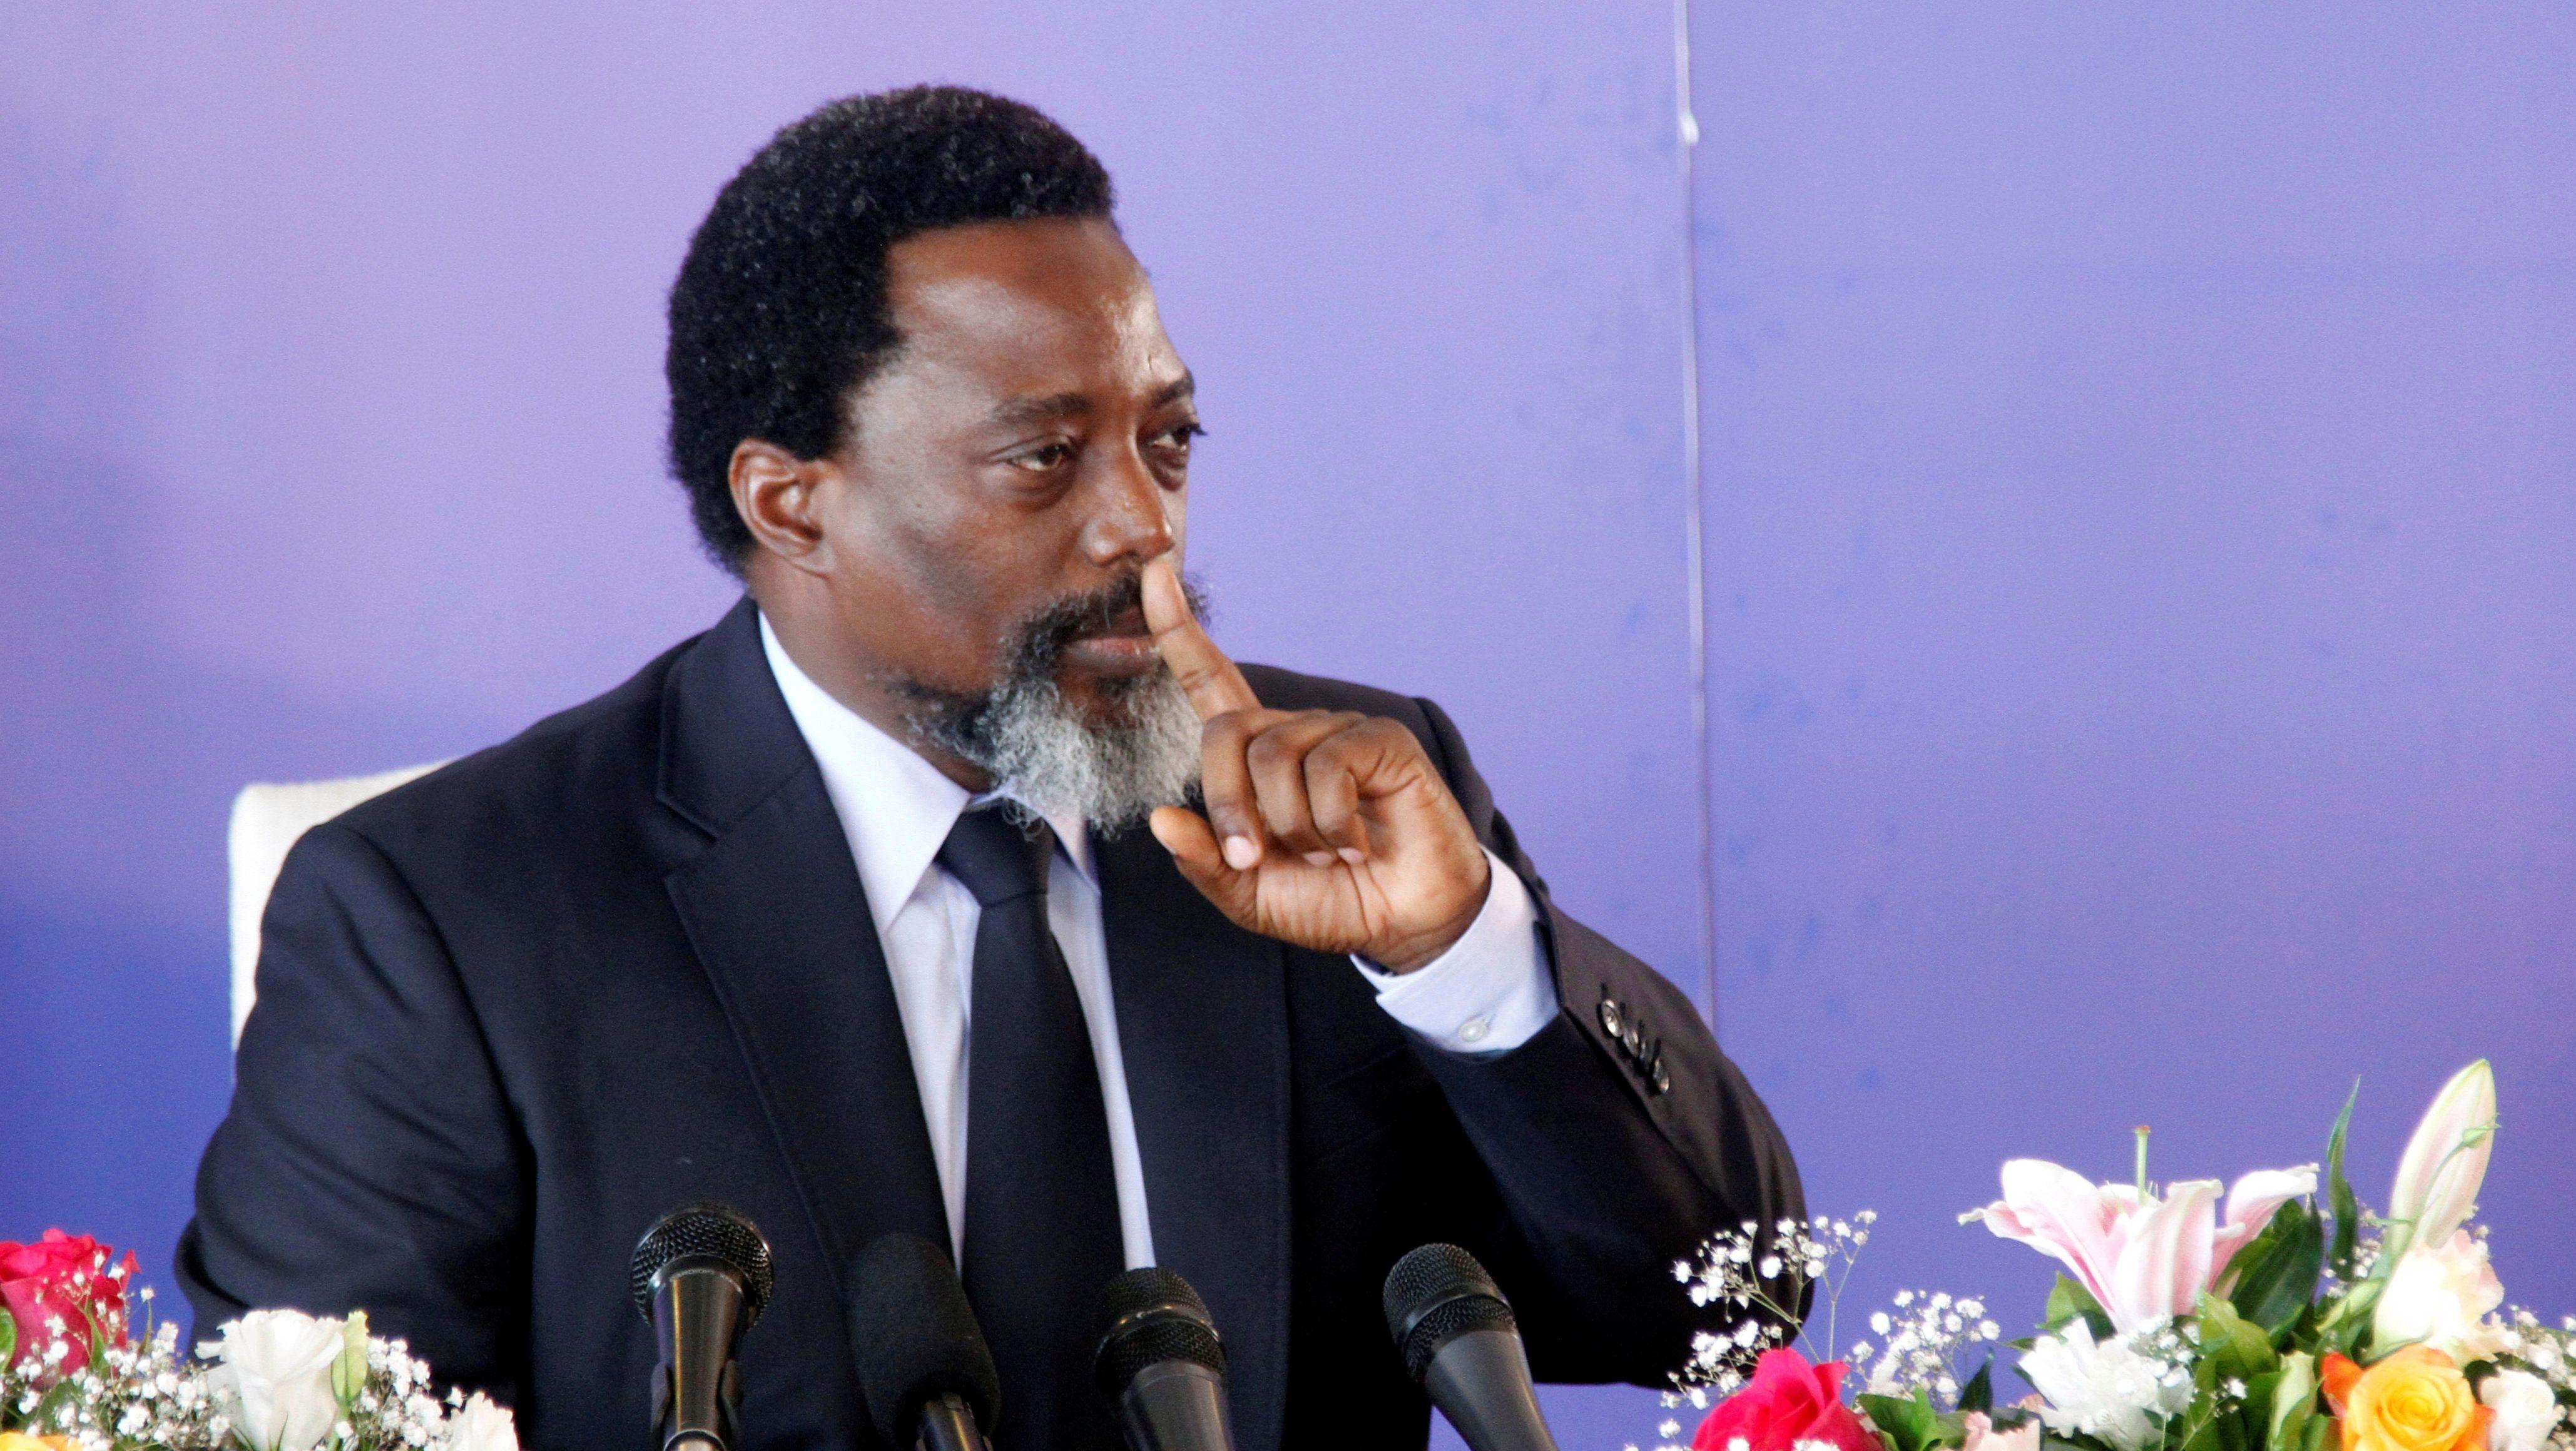 FILE PHOTO: Democratic Republic of Congo's President Joseph Kabila addresses a news conference at the State House in Kinshasa, Democratic Republic of Congo January 26, 2018.